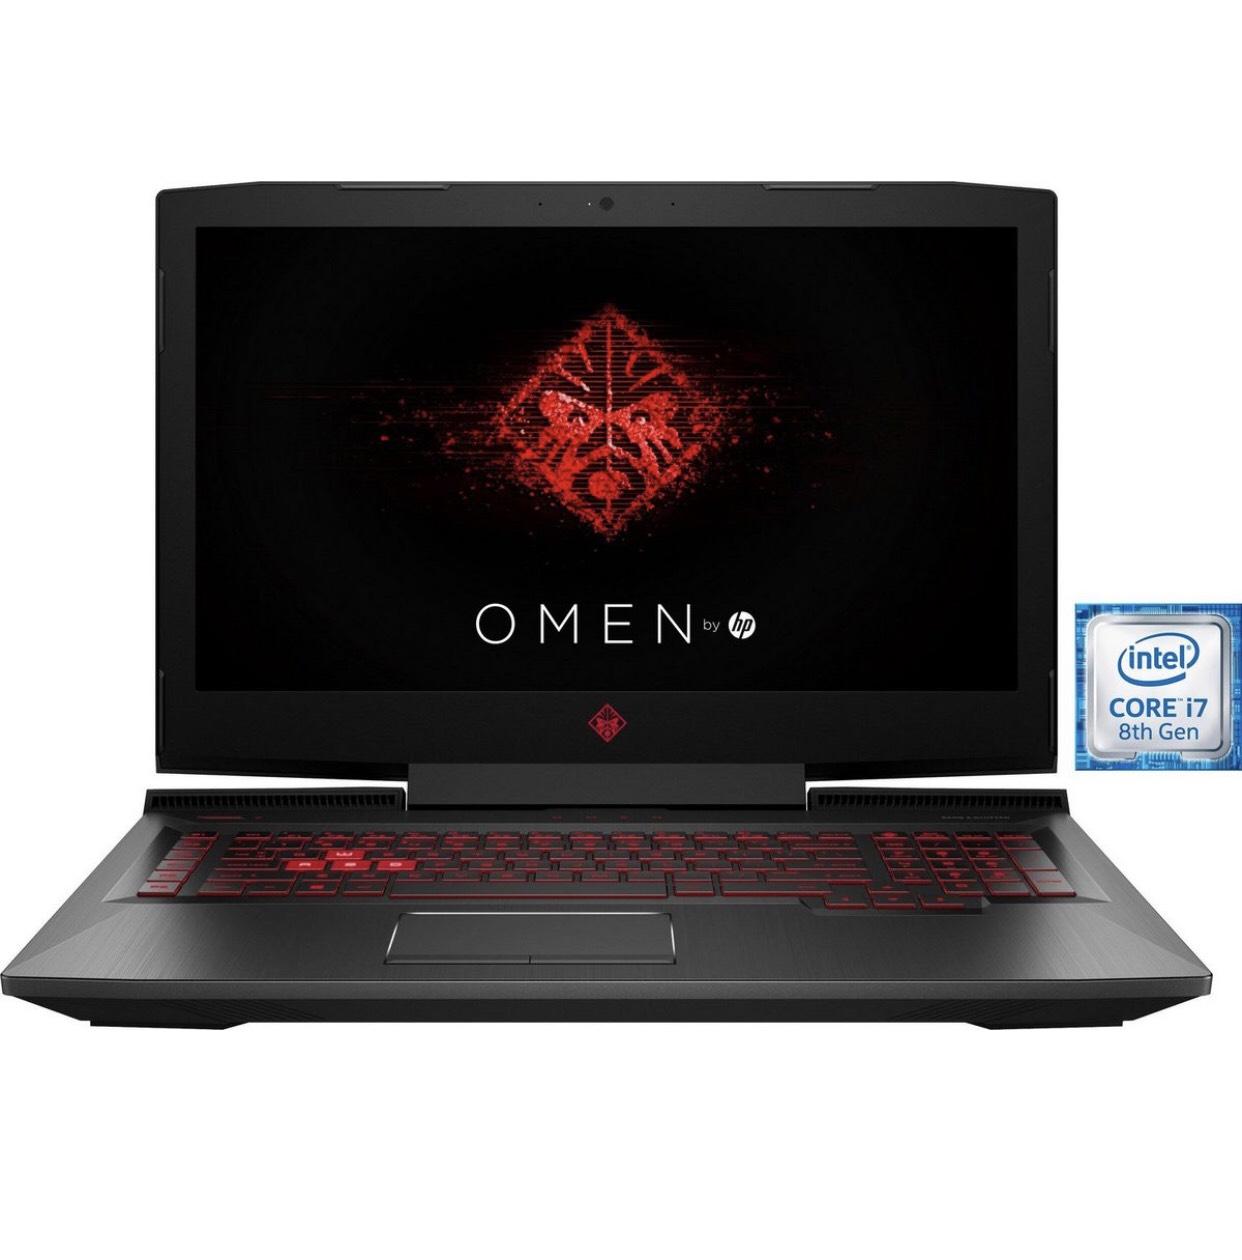 HP 17-an106ng Notebook (43,9 cm/17,3 Zoll, GTX 1070, i7-8750H, IPS, 120hz, 1000 GB HDD, 256 GB SSD)